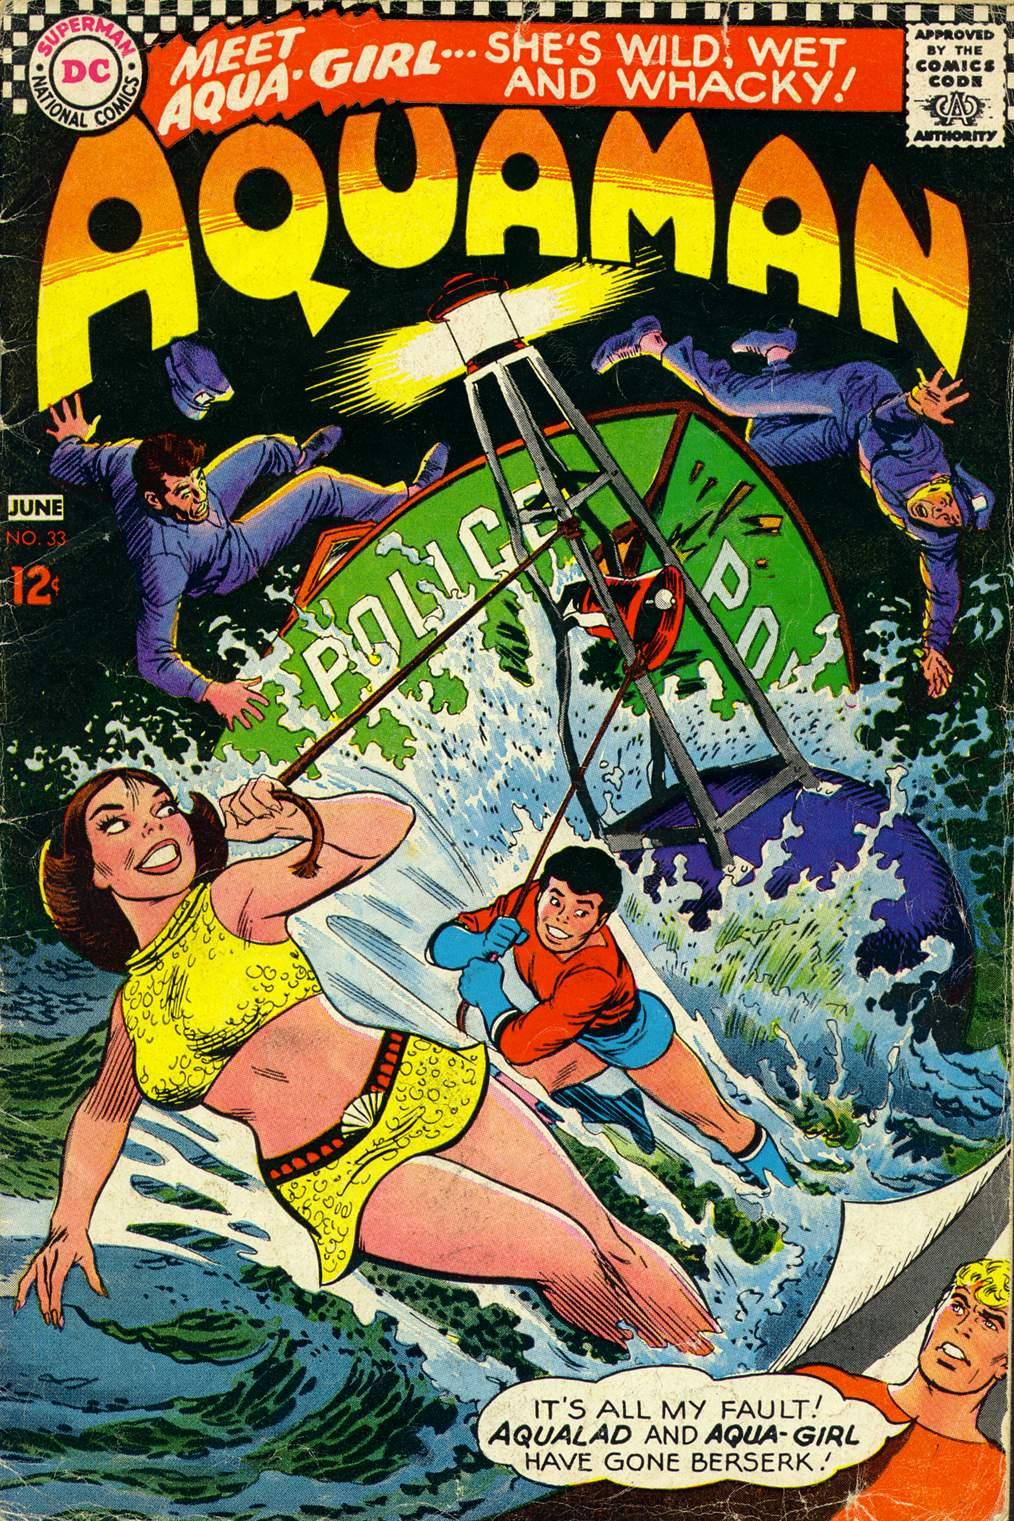 Aquaman (1962) issue 33 - Page 1